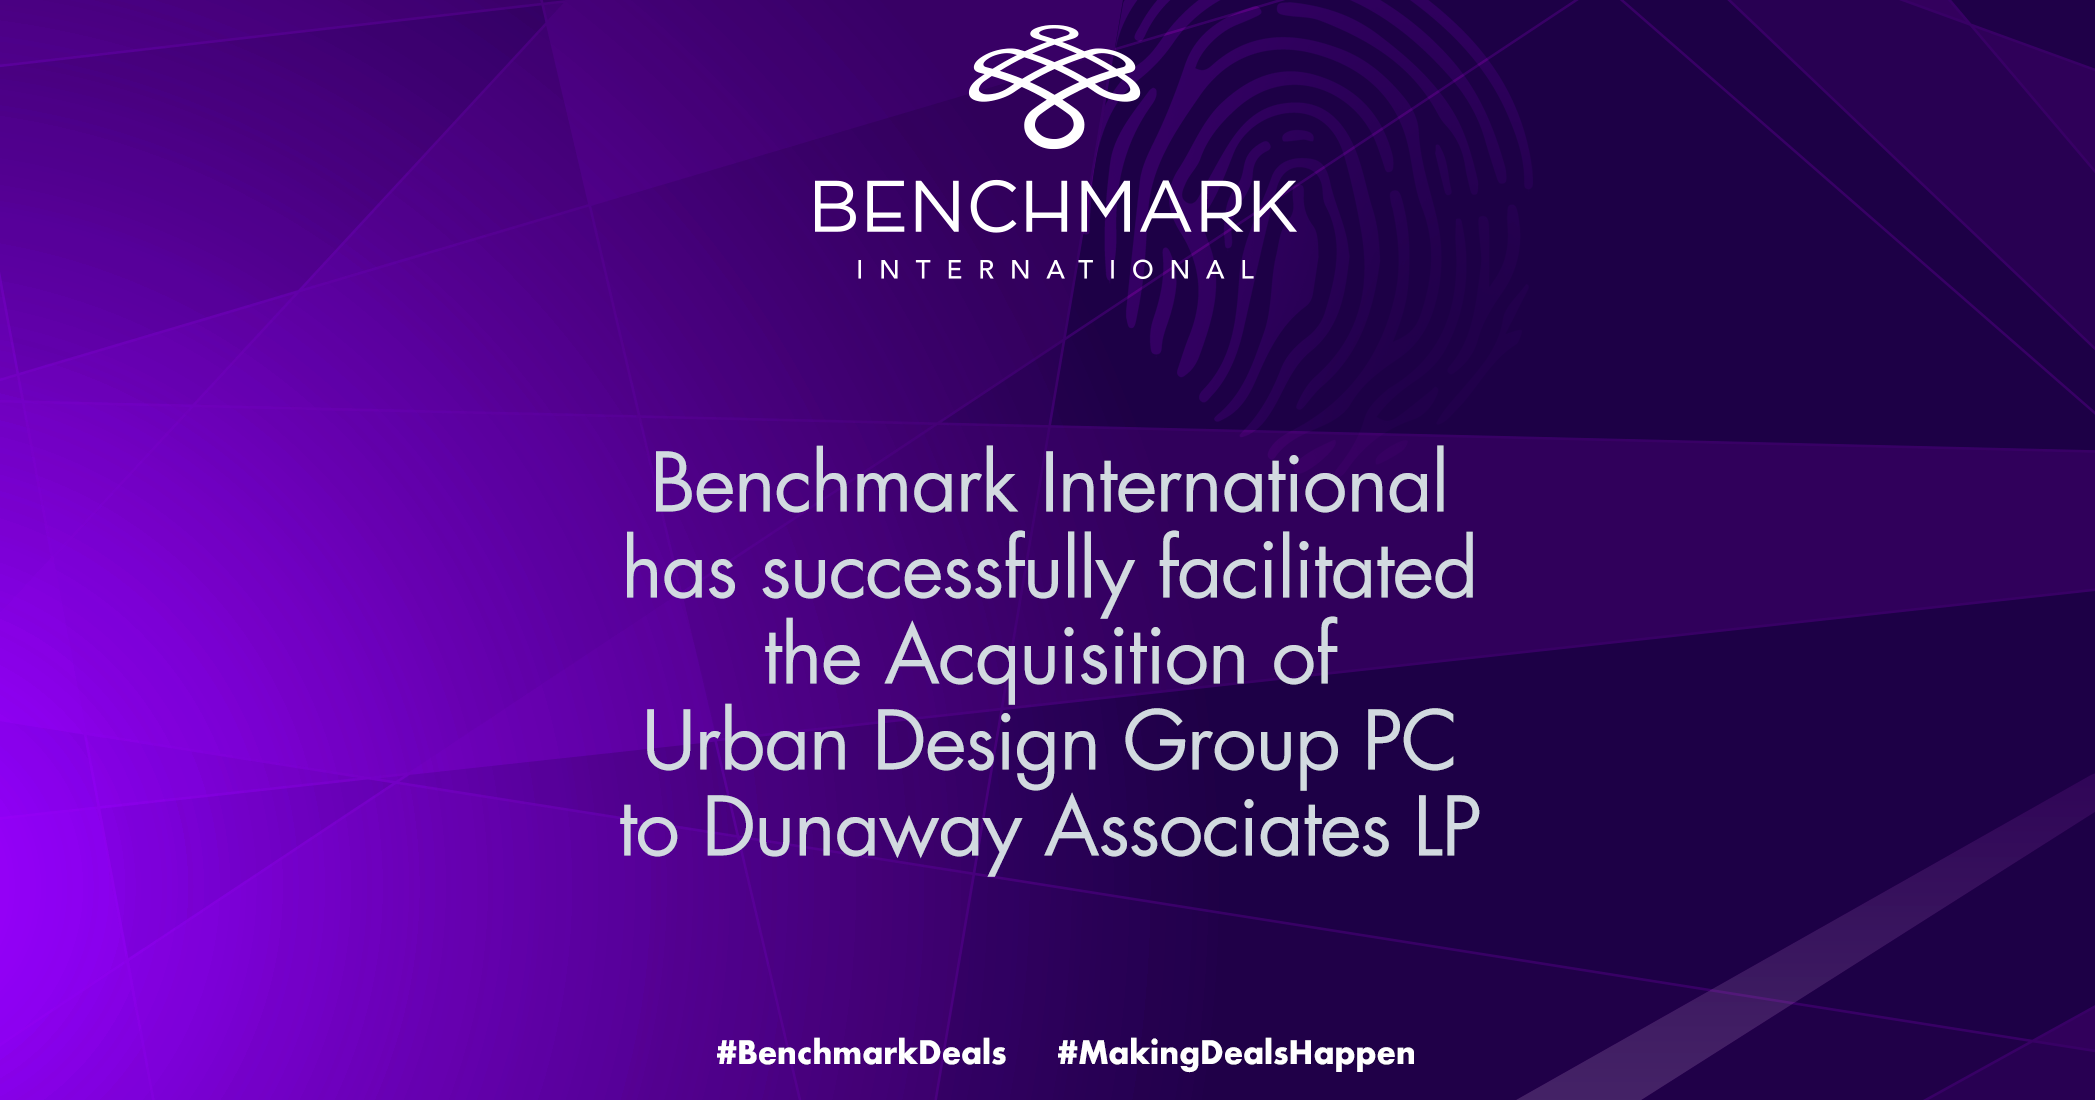 Benchmark international Facilitates the Acquisition of Urban Design Group PC to Dunaway Associates LP